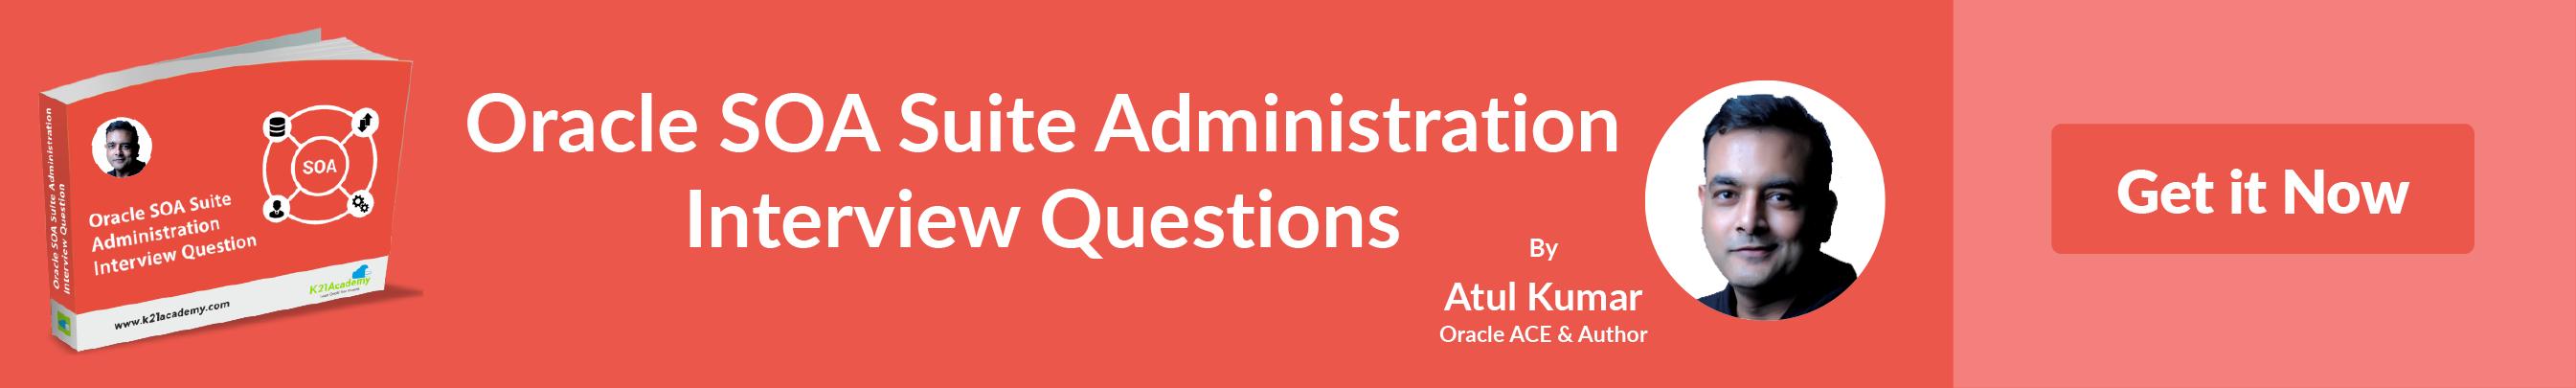 soa suite administration interview question